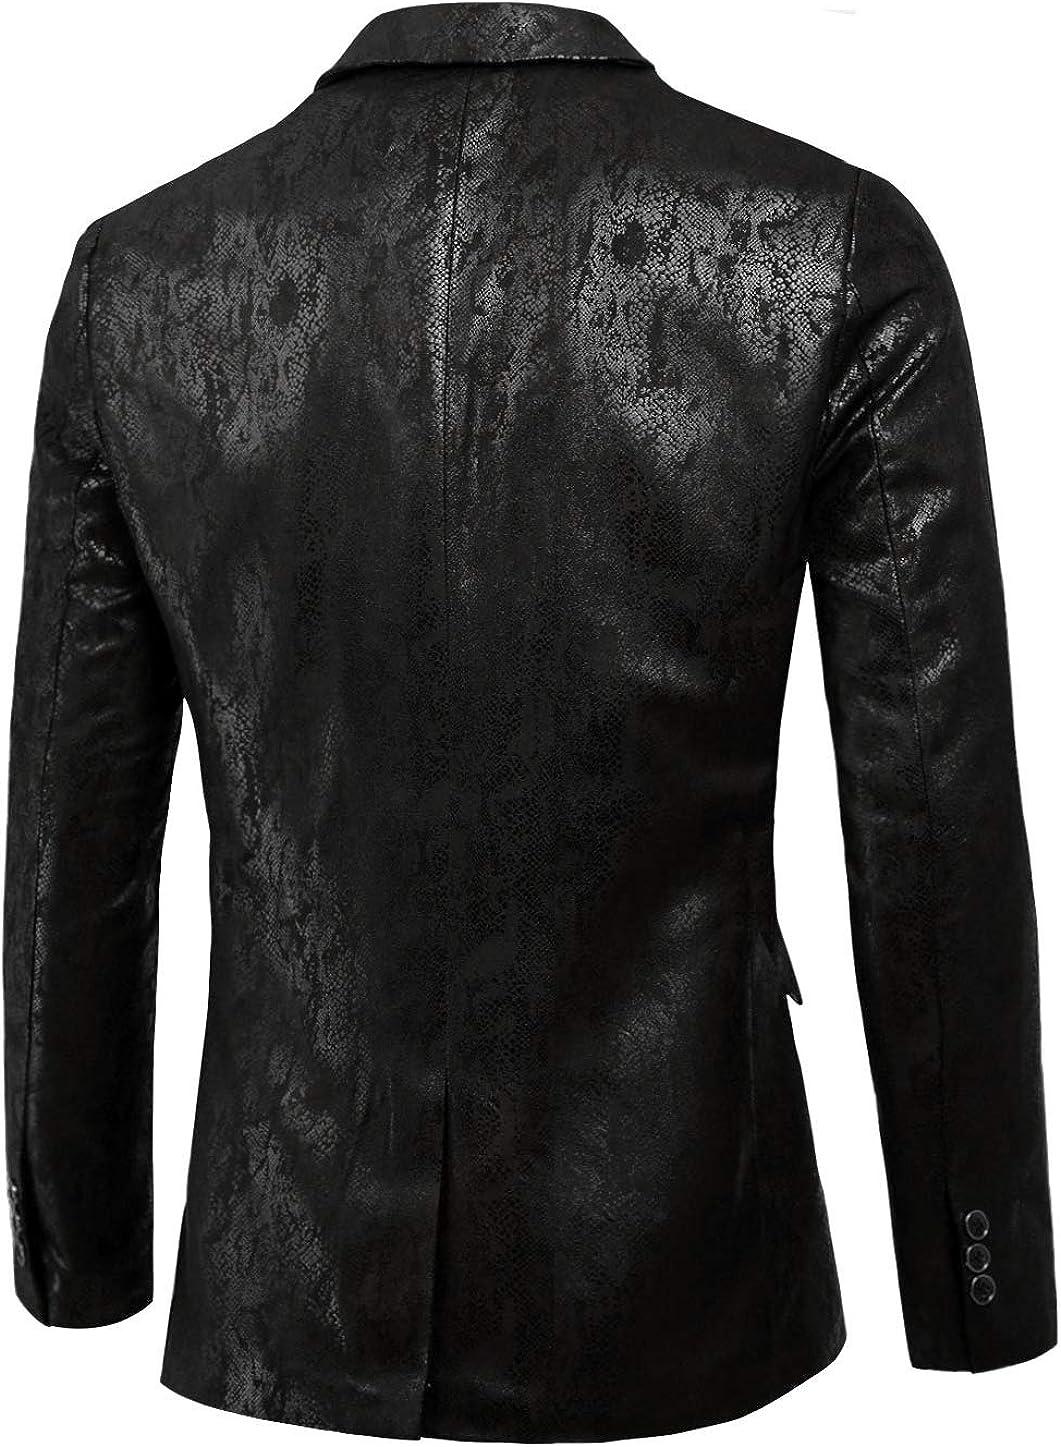 Lars Amadeus Mens Party Animal Print Blazer Notched Lapel Lightweight Sport Coat Suit Jacket